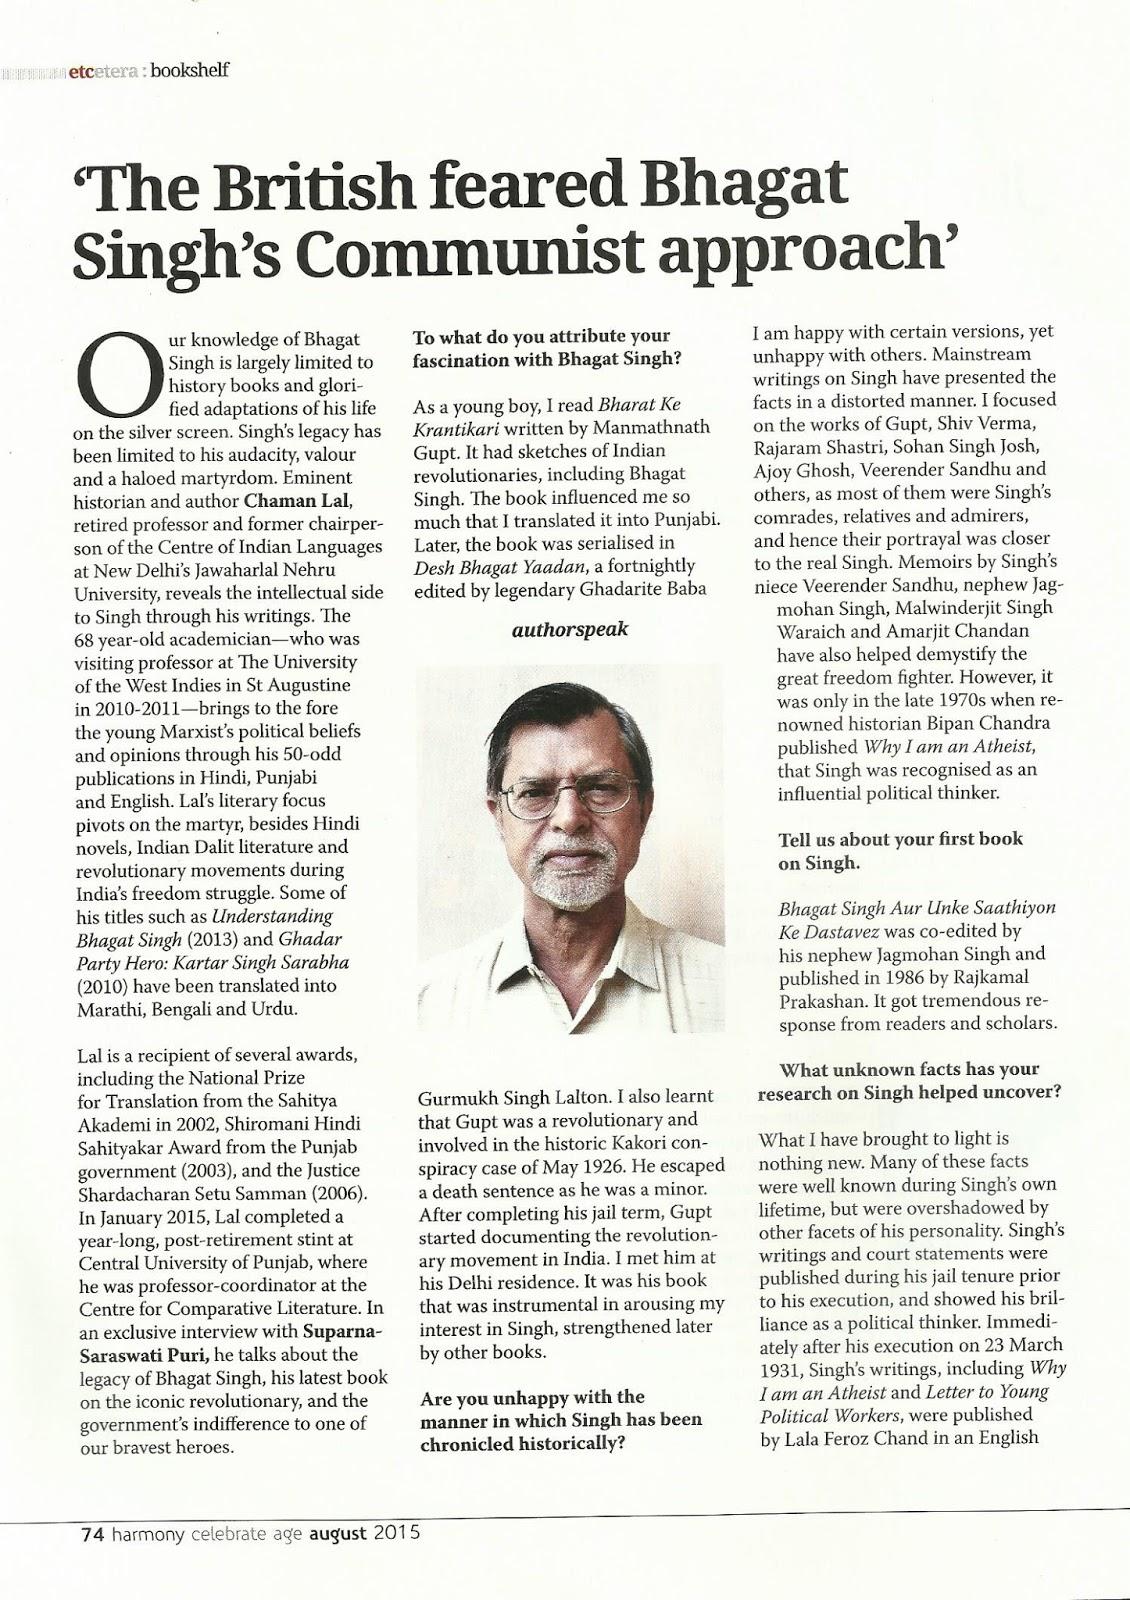 017 Essay On Bhagat Singh In Marathi Example Interview2bon2bbs Harmony Unique Short 100 Words Full